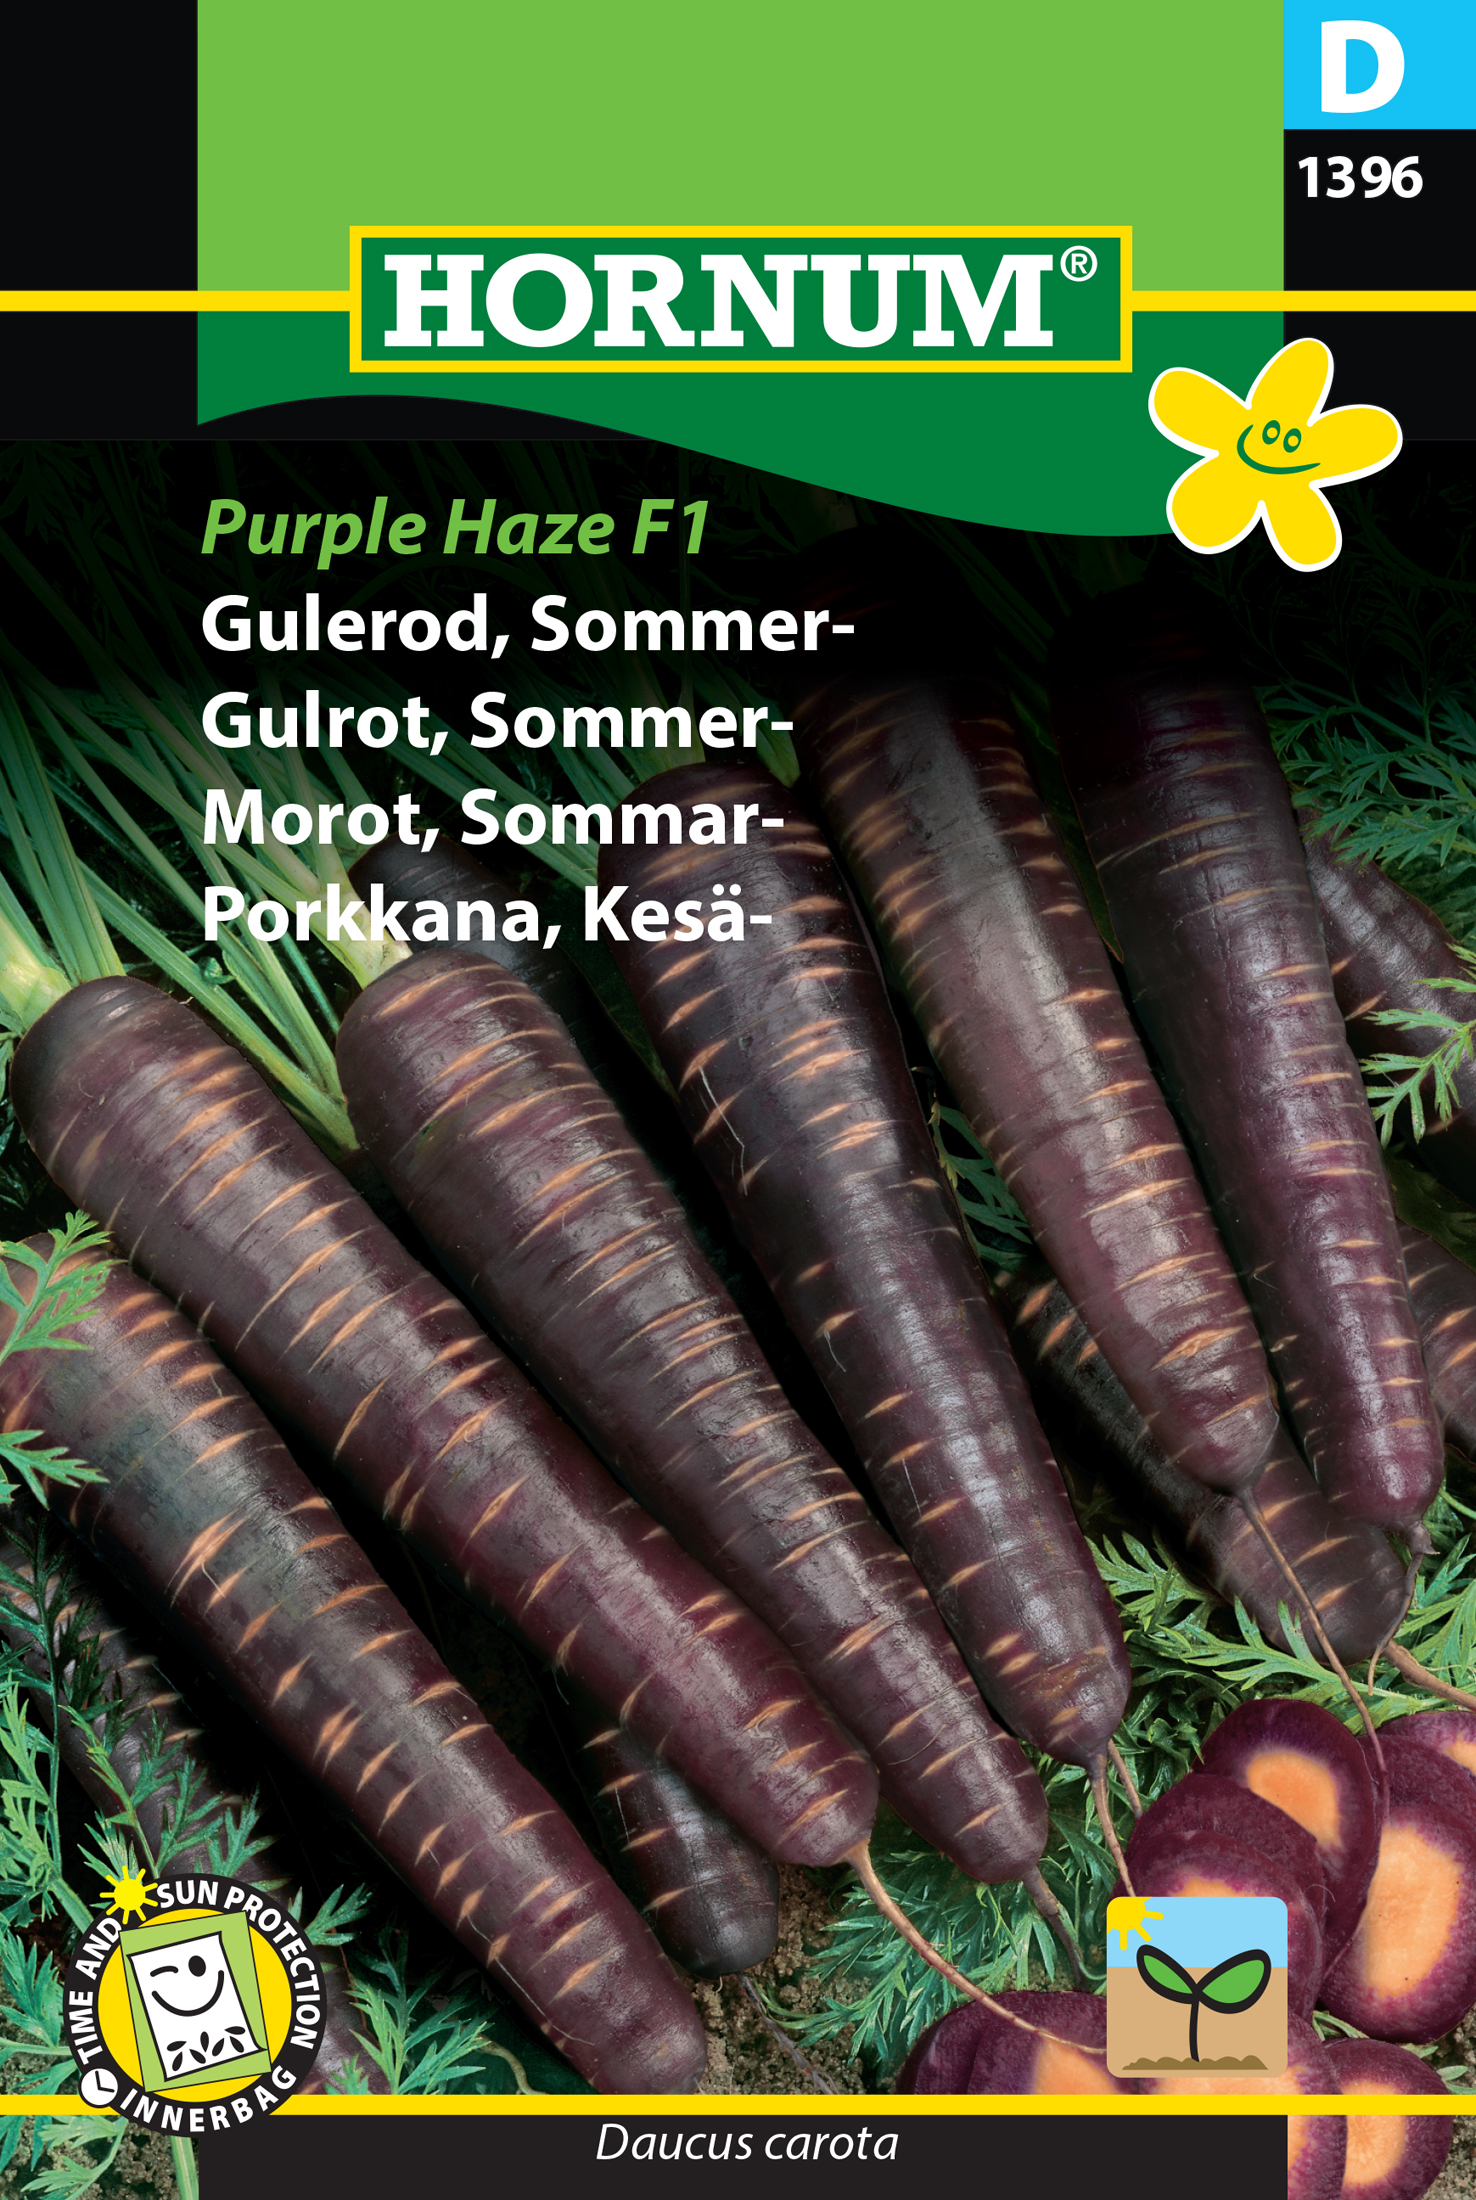 Morot, Sommar- 'Purple Haze' F1